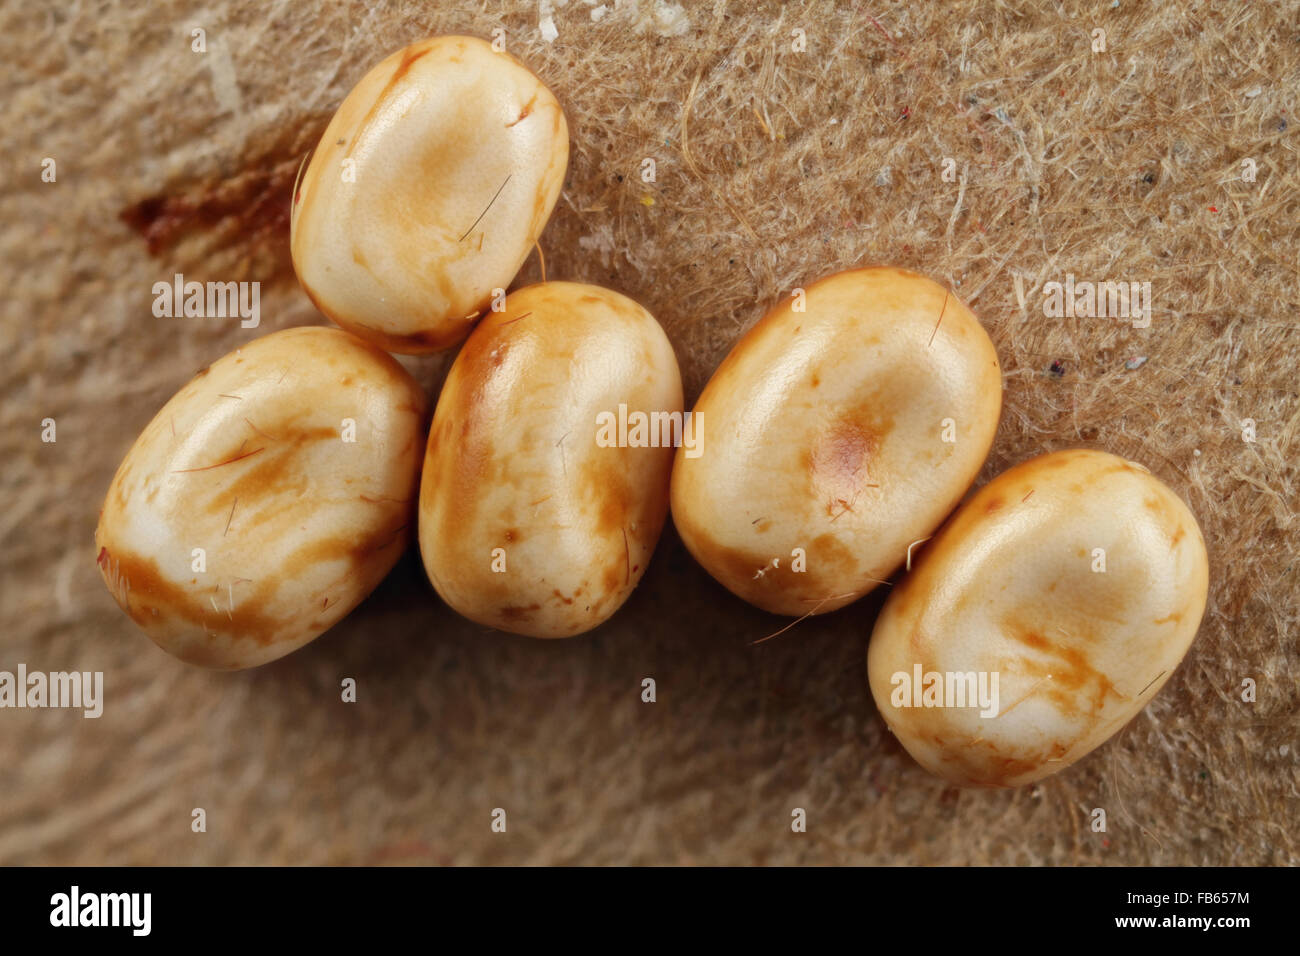 Eggs of the cecropia moth, Hyalophora cecropia. - Stock Image